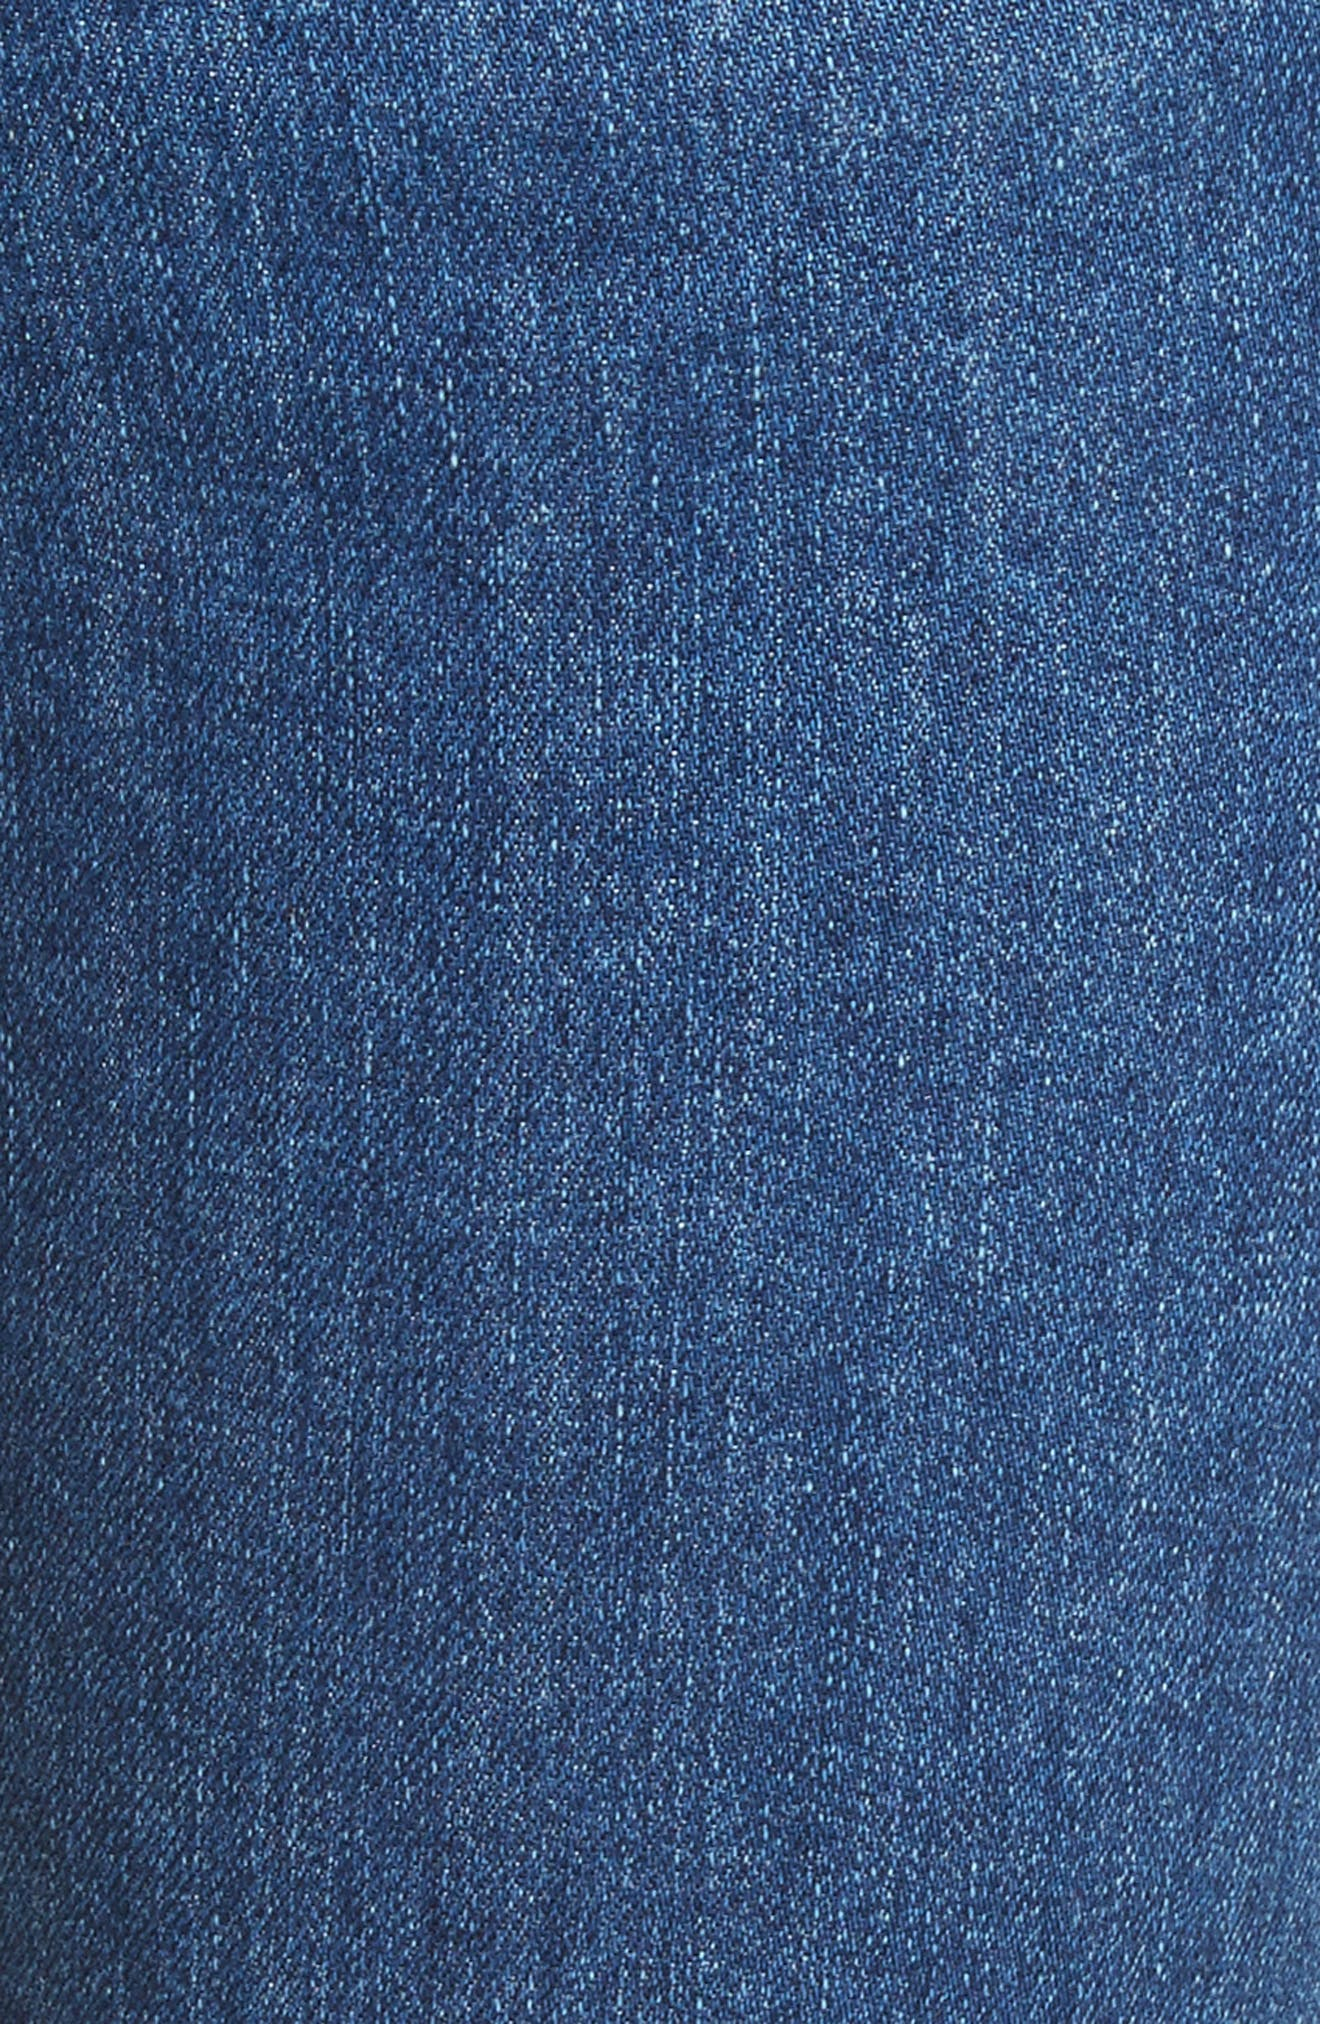 Hana High Waist Crop Bootcut Jeans,                             Alternate thumbnail 5, color,                             420